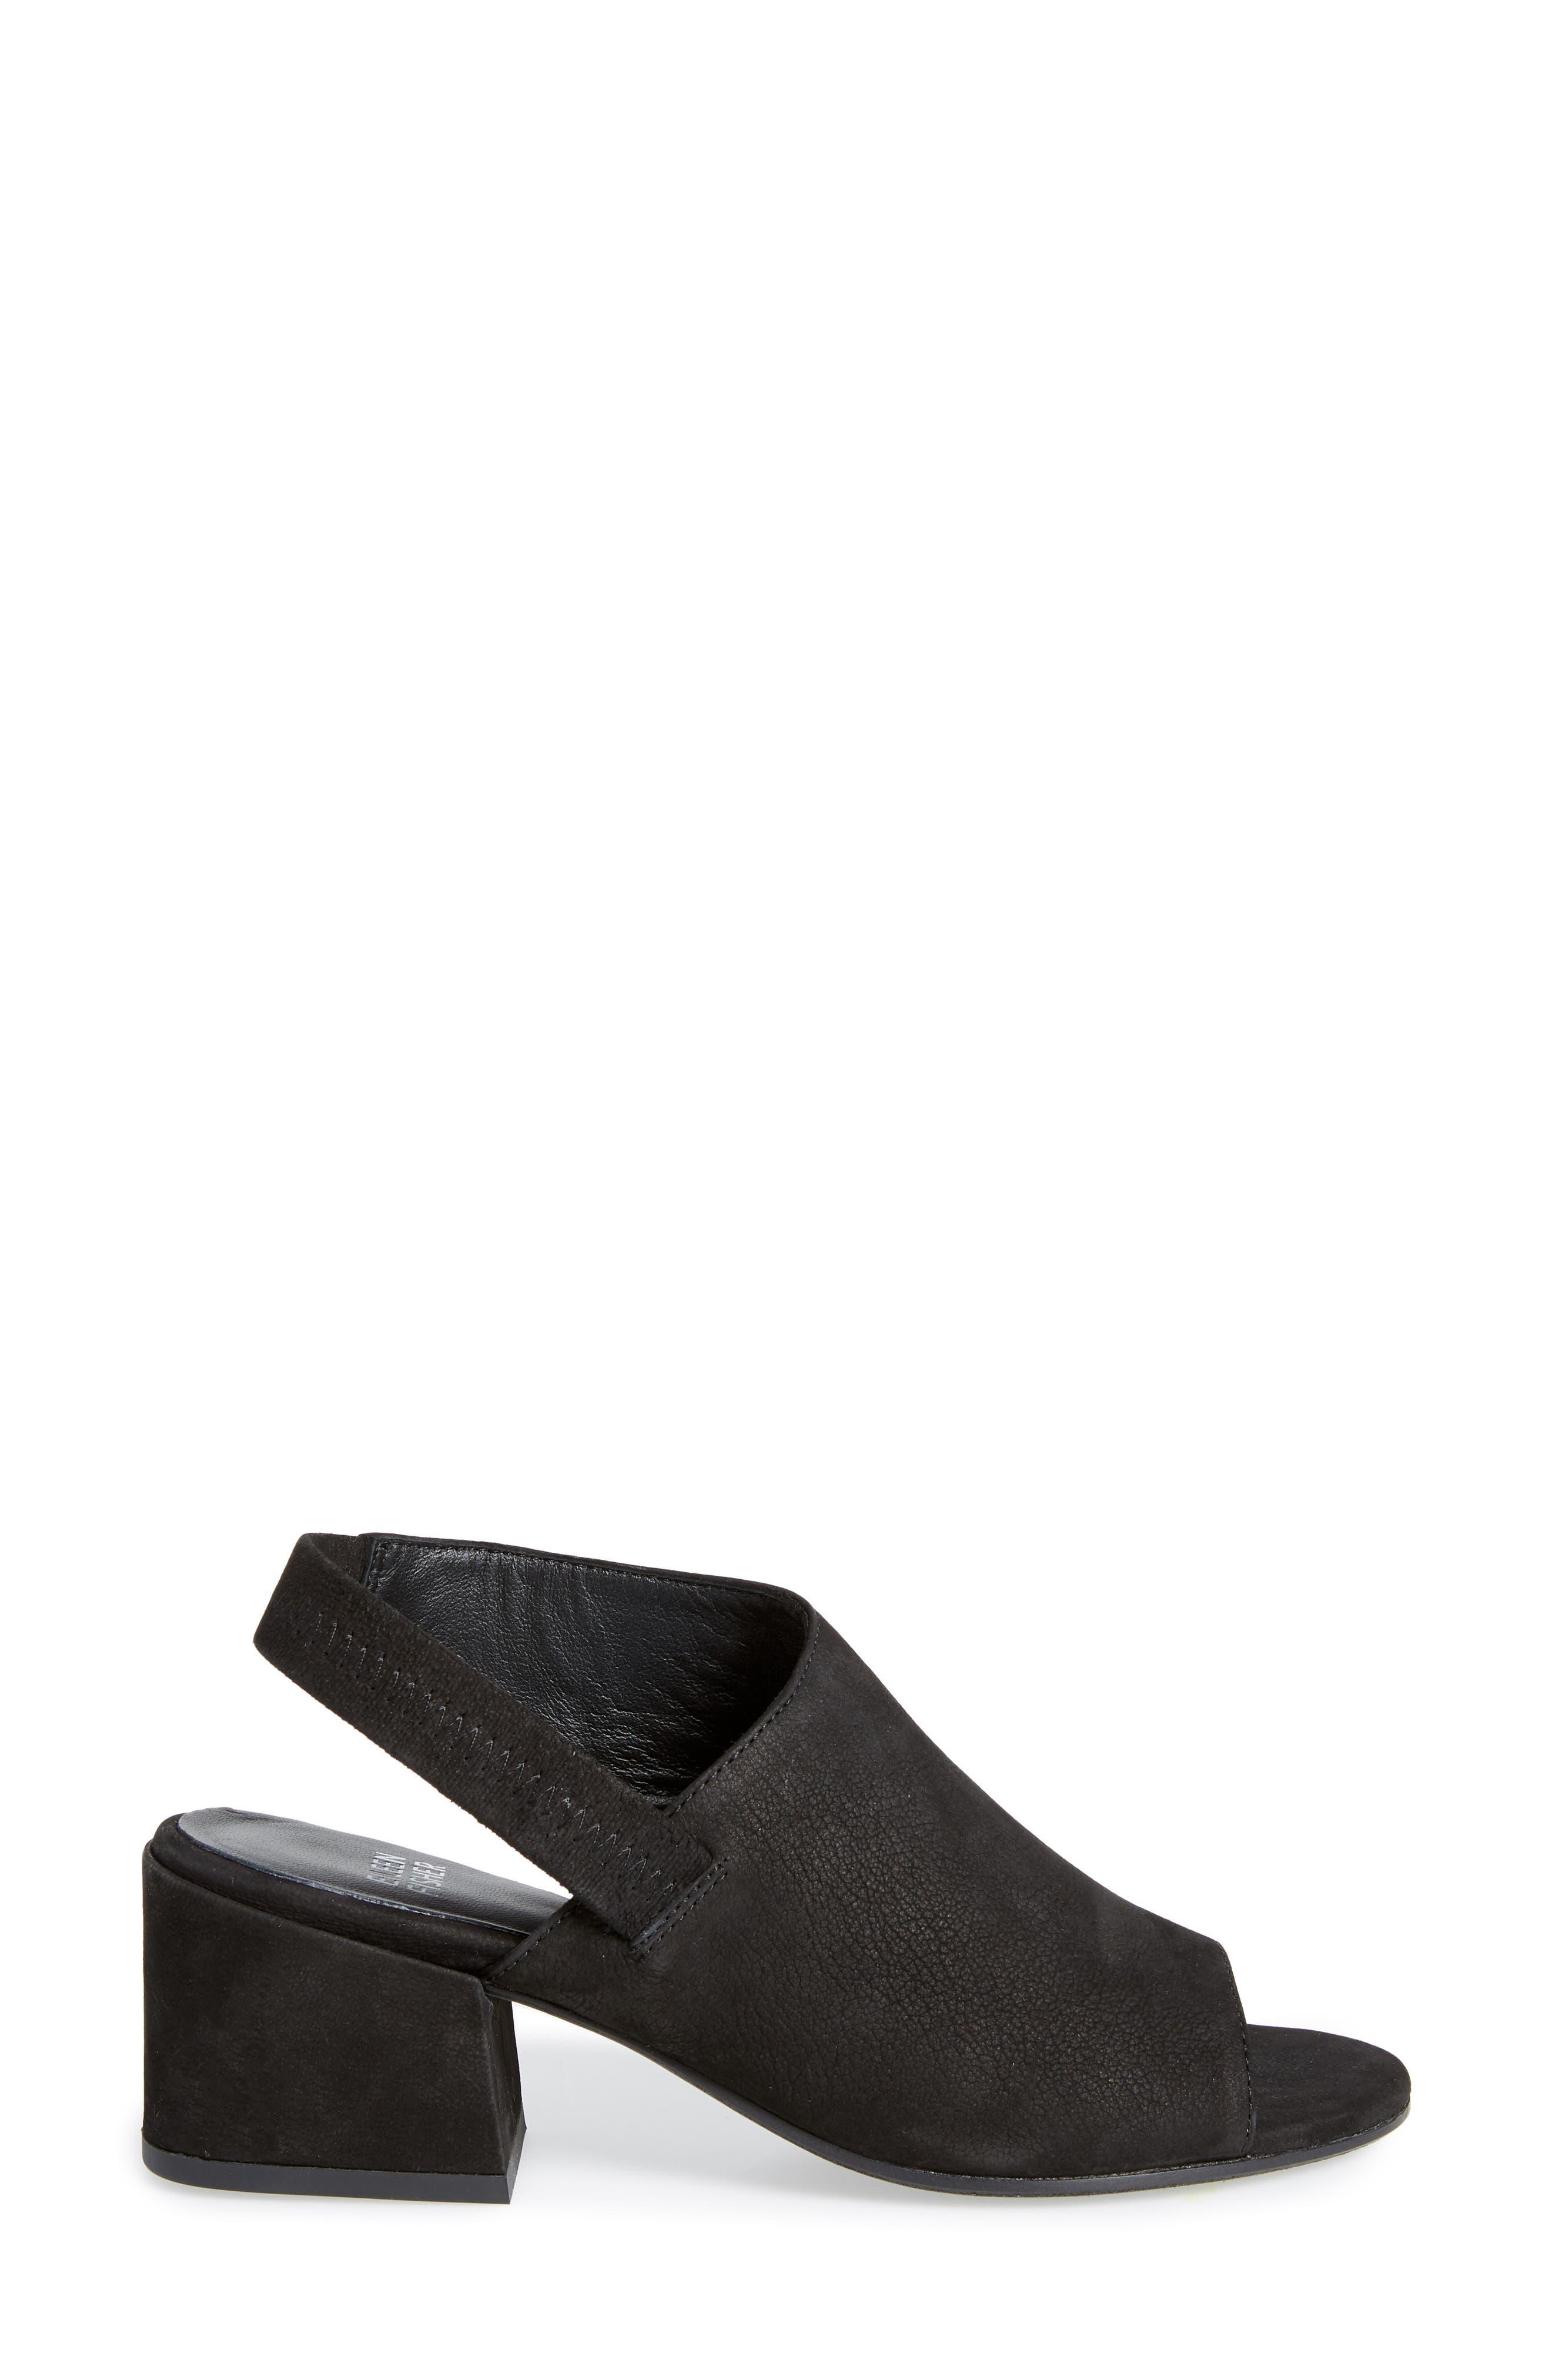 Leigh Asymmetrical Slingback Sandal,                             Alternate thumbnail 7, color,